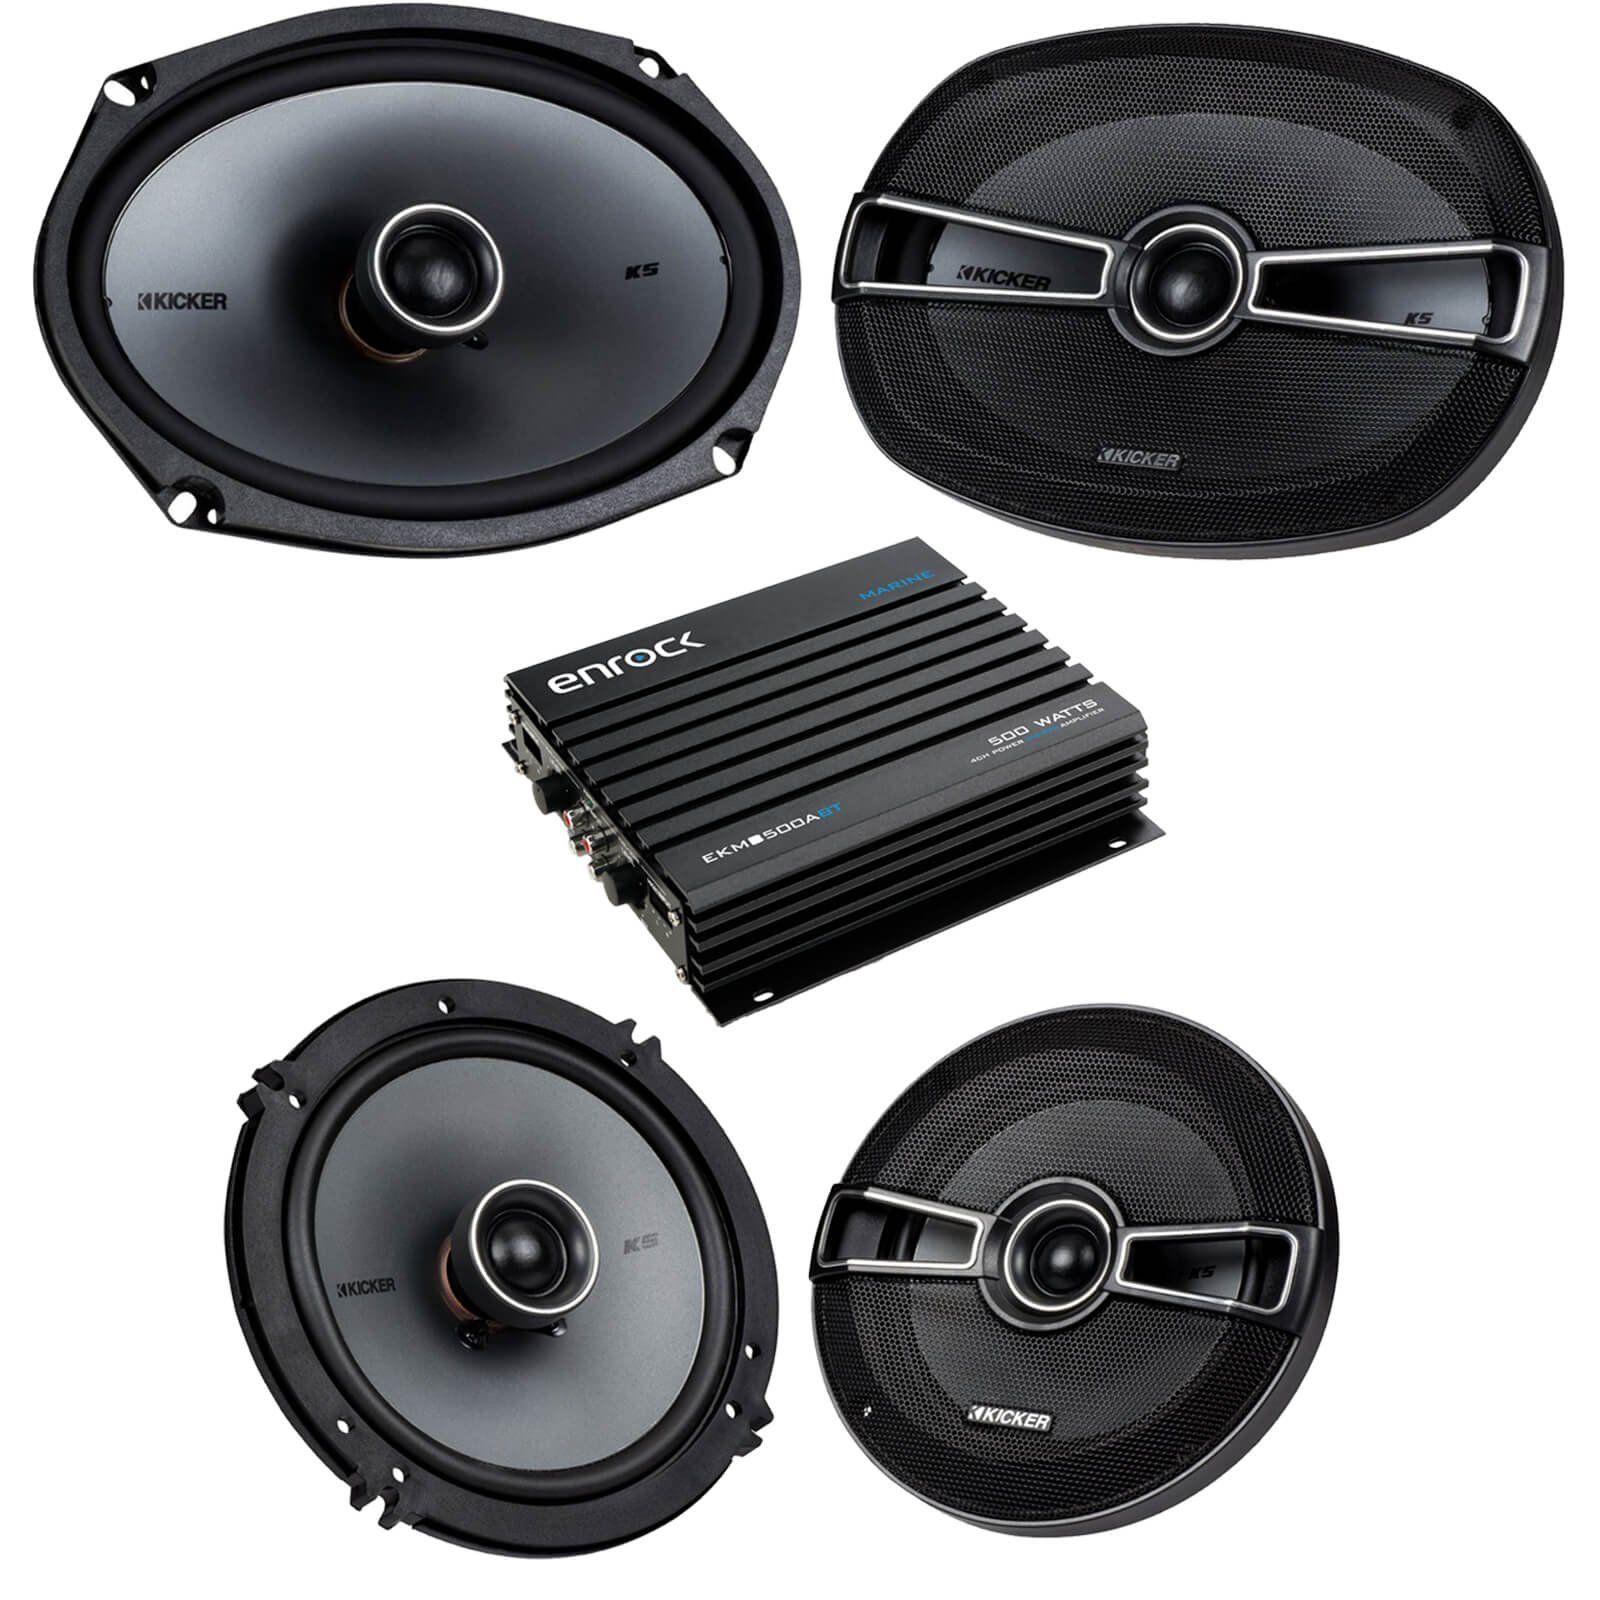 car speaker bluetooth streming set bundle combo with 2 kicker 41ksc654 6 5 inch 2 way vehicle stereo speakers 2 kicker 41ksc694 6x9 car speaker system  [ 1600 x 1600 Pixel ]